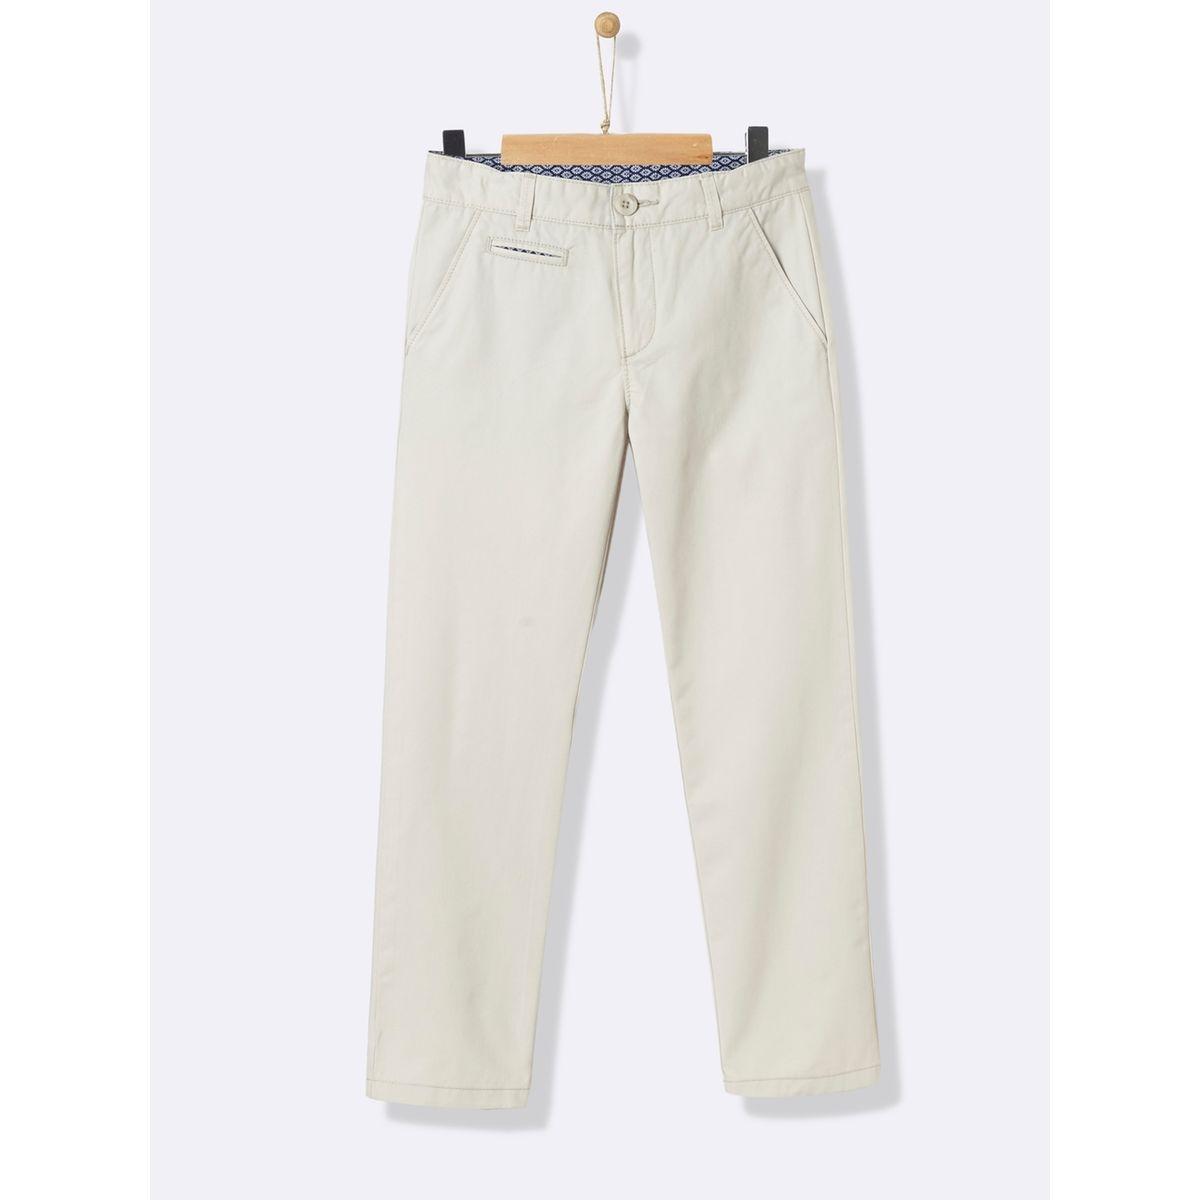 Pantalon chino garçon